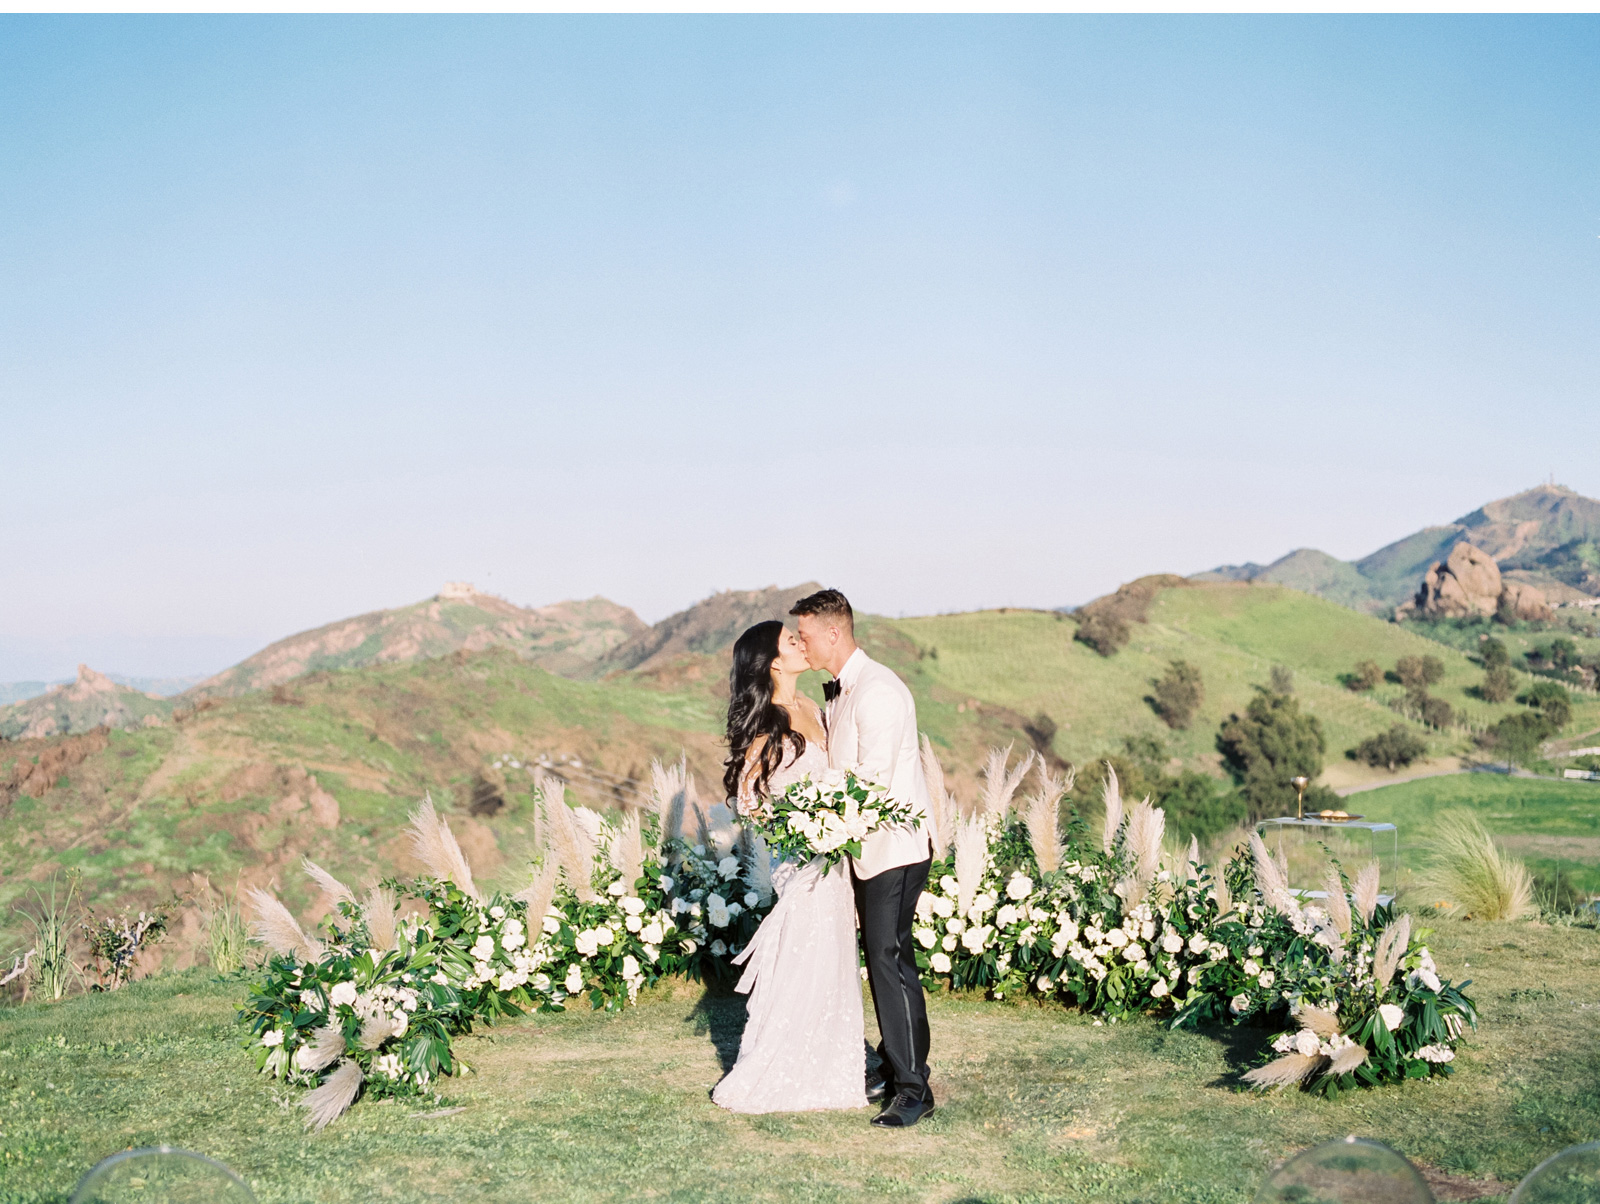 Malibu-Rocky-Oaks-Wedding-Style-Me-Pretty-Southern-California-Wedding-Venues-Fine-Art-Wedding-Photogrpaher-Natalie-Schutt-Photography_09.jpg